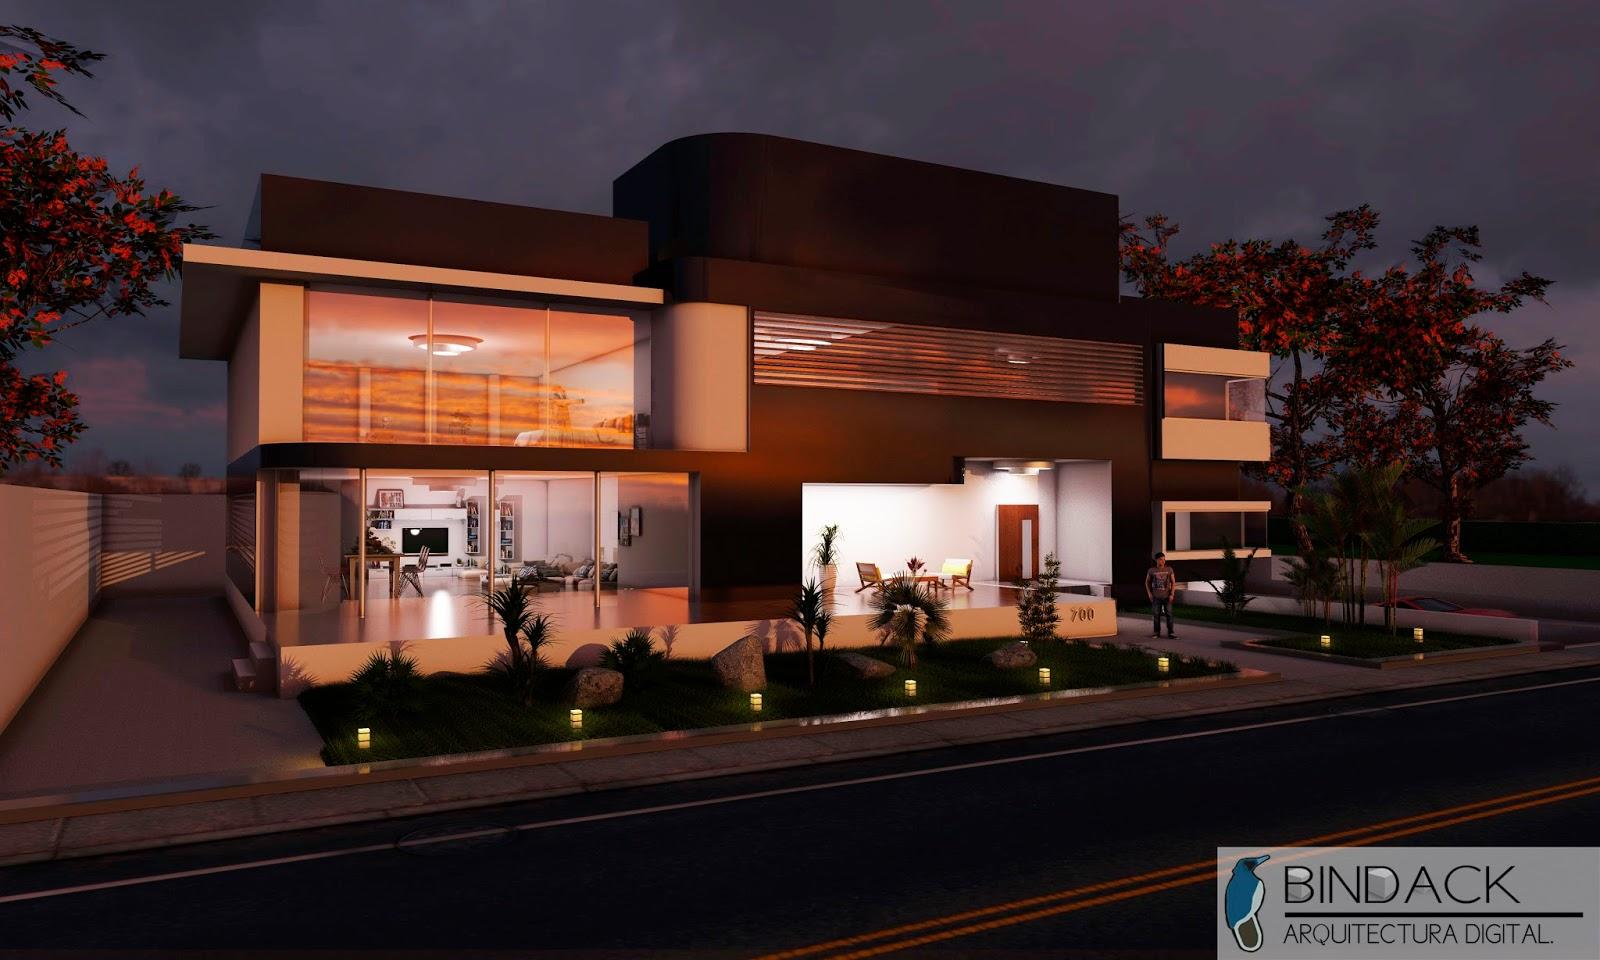 Bindack Arquitectura Digital Portafolio Casa S Bado